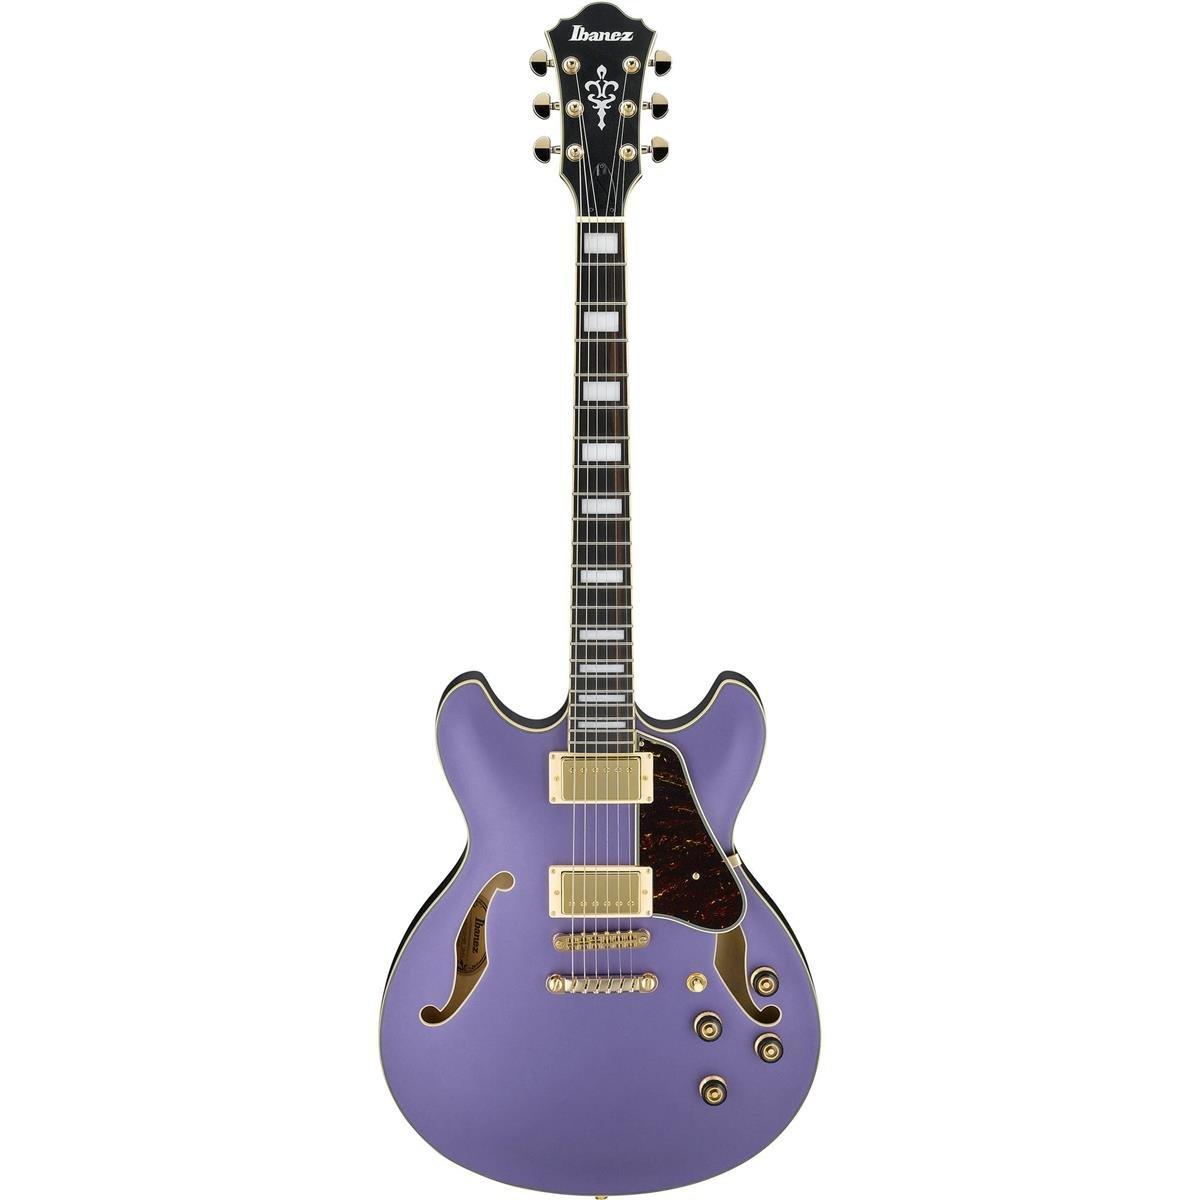 (Pre-Order) Ibanez Artcore AS73GMPF Electric Guitar - Metallic Purple Flat